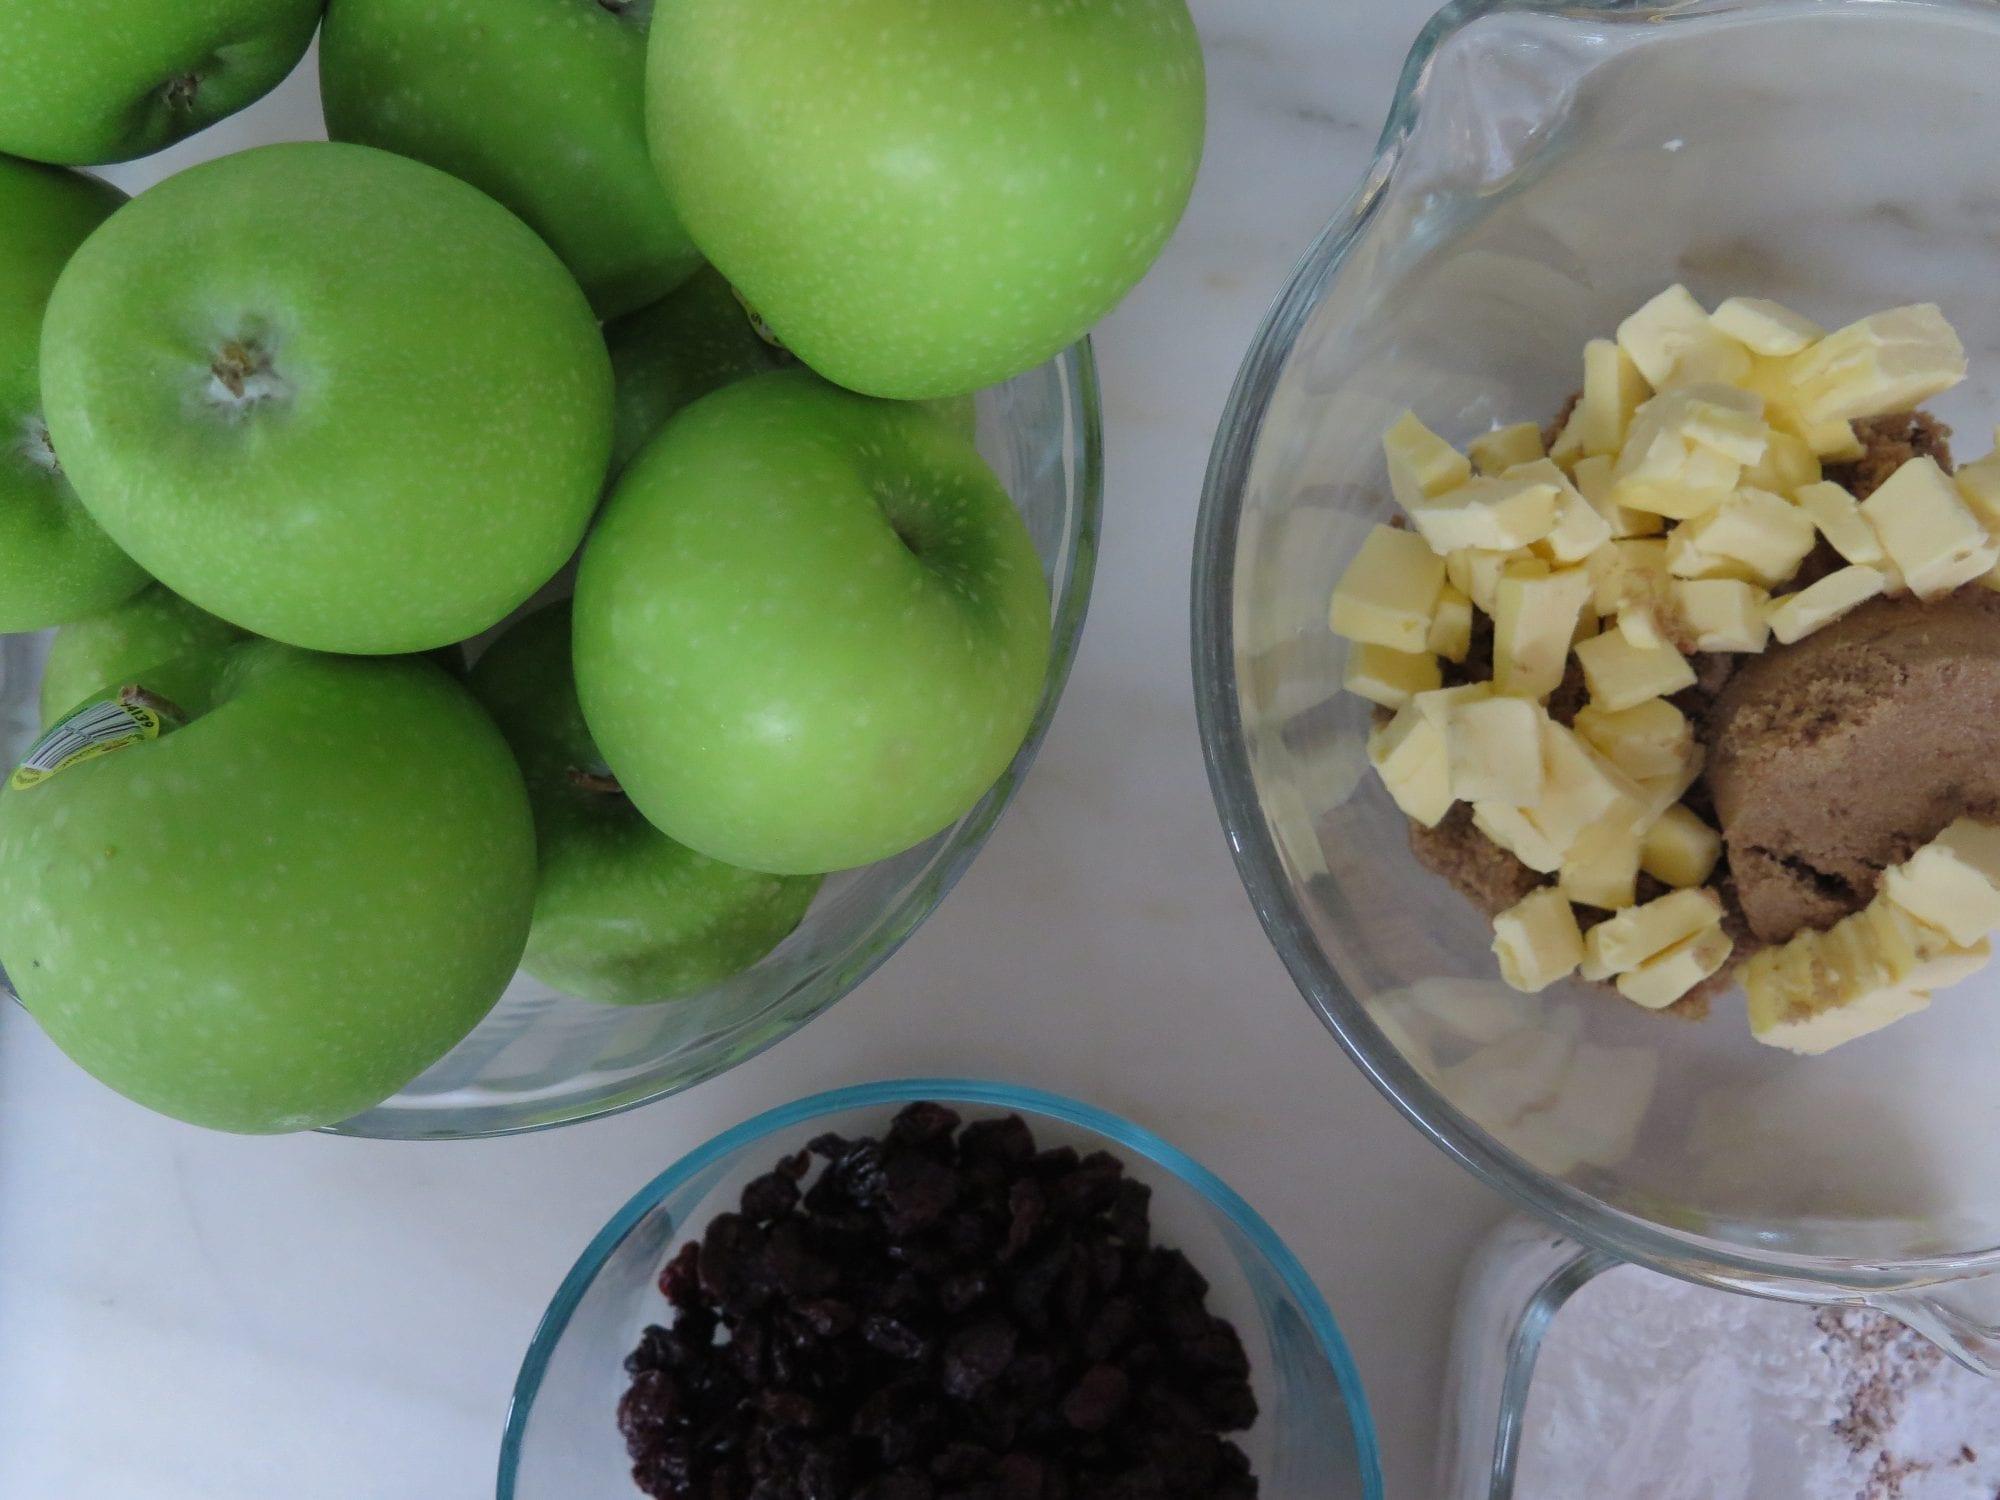 Apples, Cherries and Pie Crumble | Jessie Sheehan Bakes